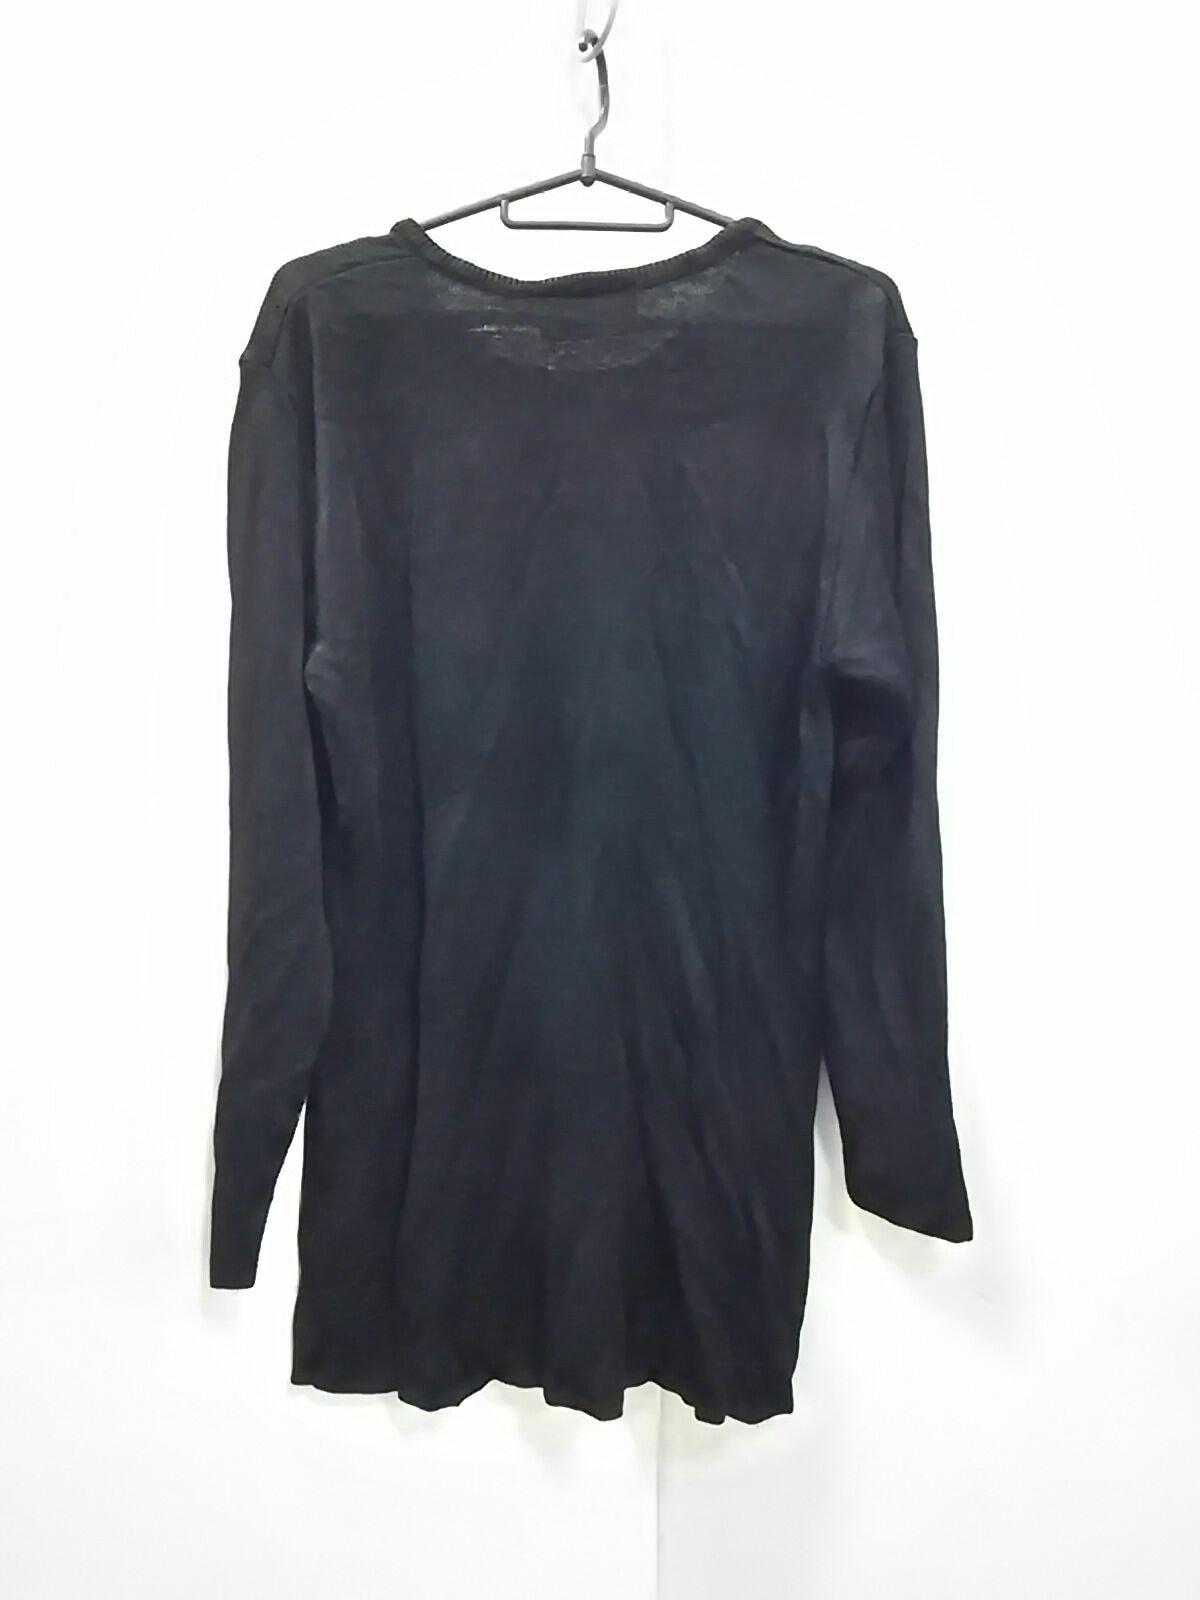 marimekko(マリメッコ)のセーター